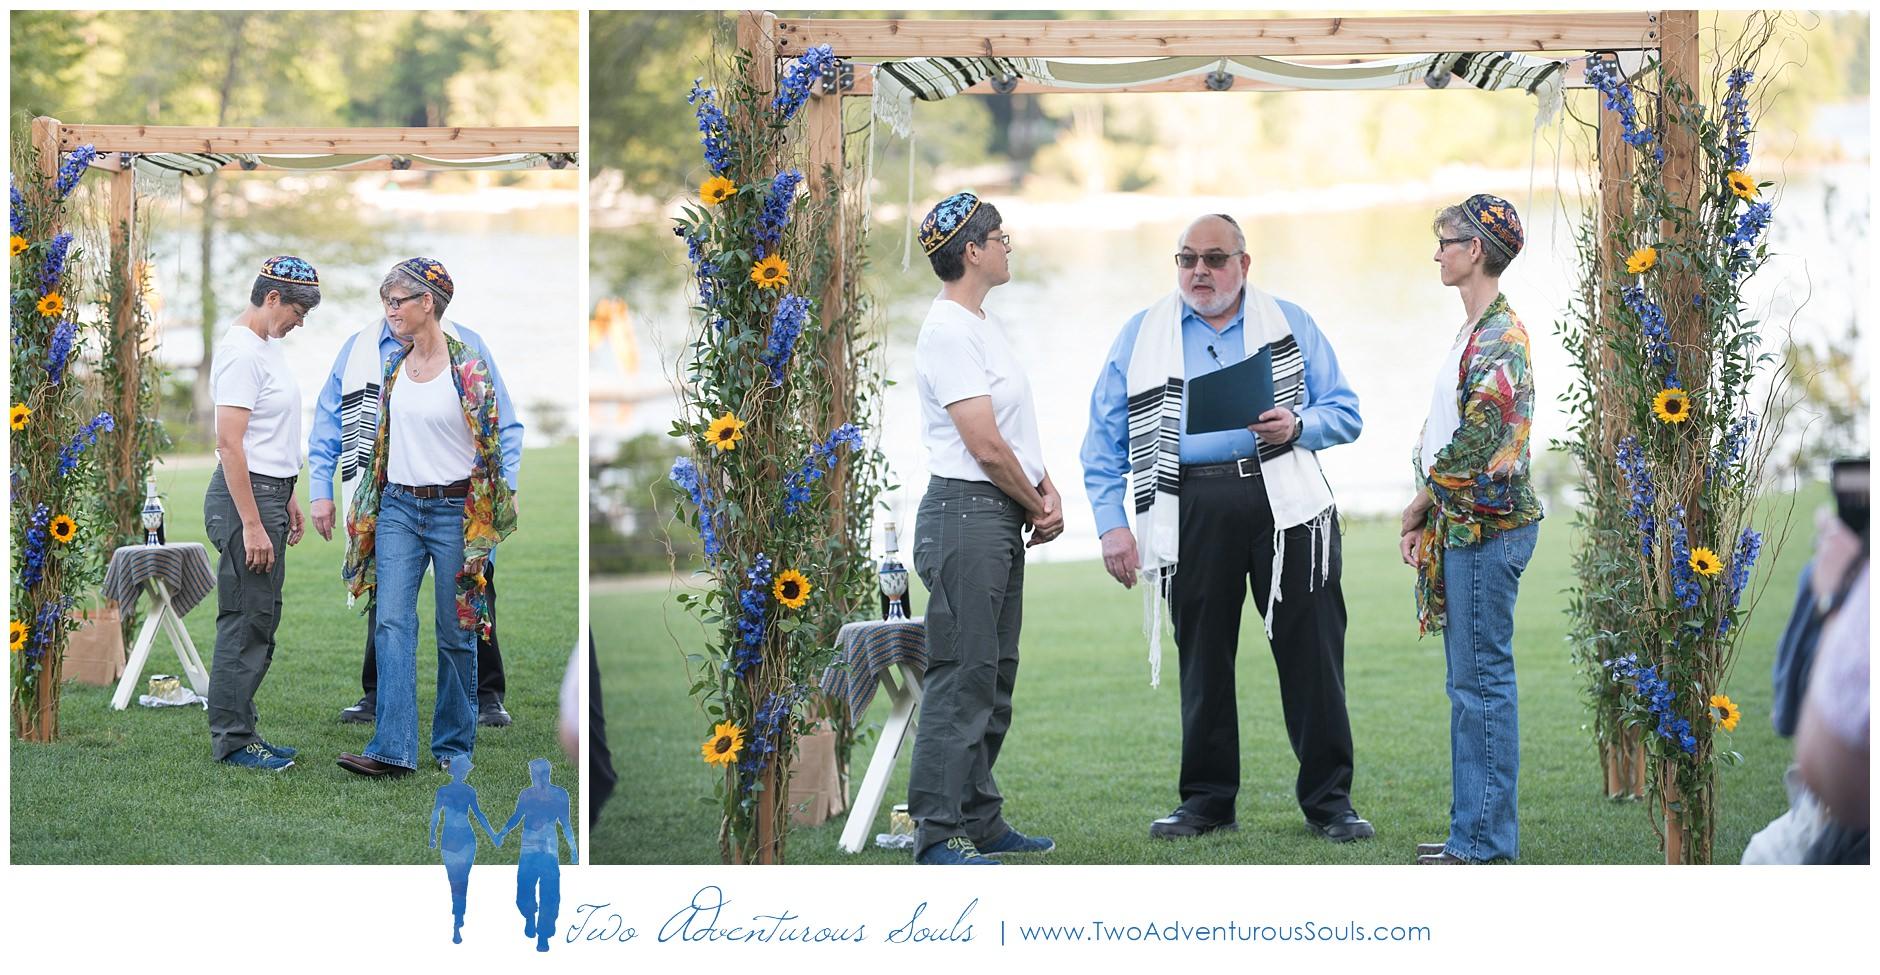 090217-Mindy-Karen-sneaks-60_WEB-Maine-Wedding-and-Portrait-Photographer.jpg